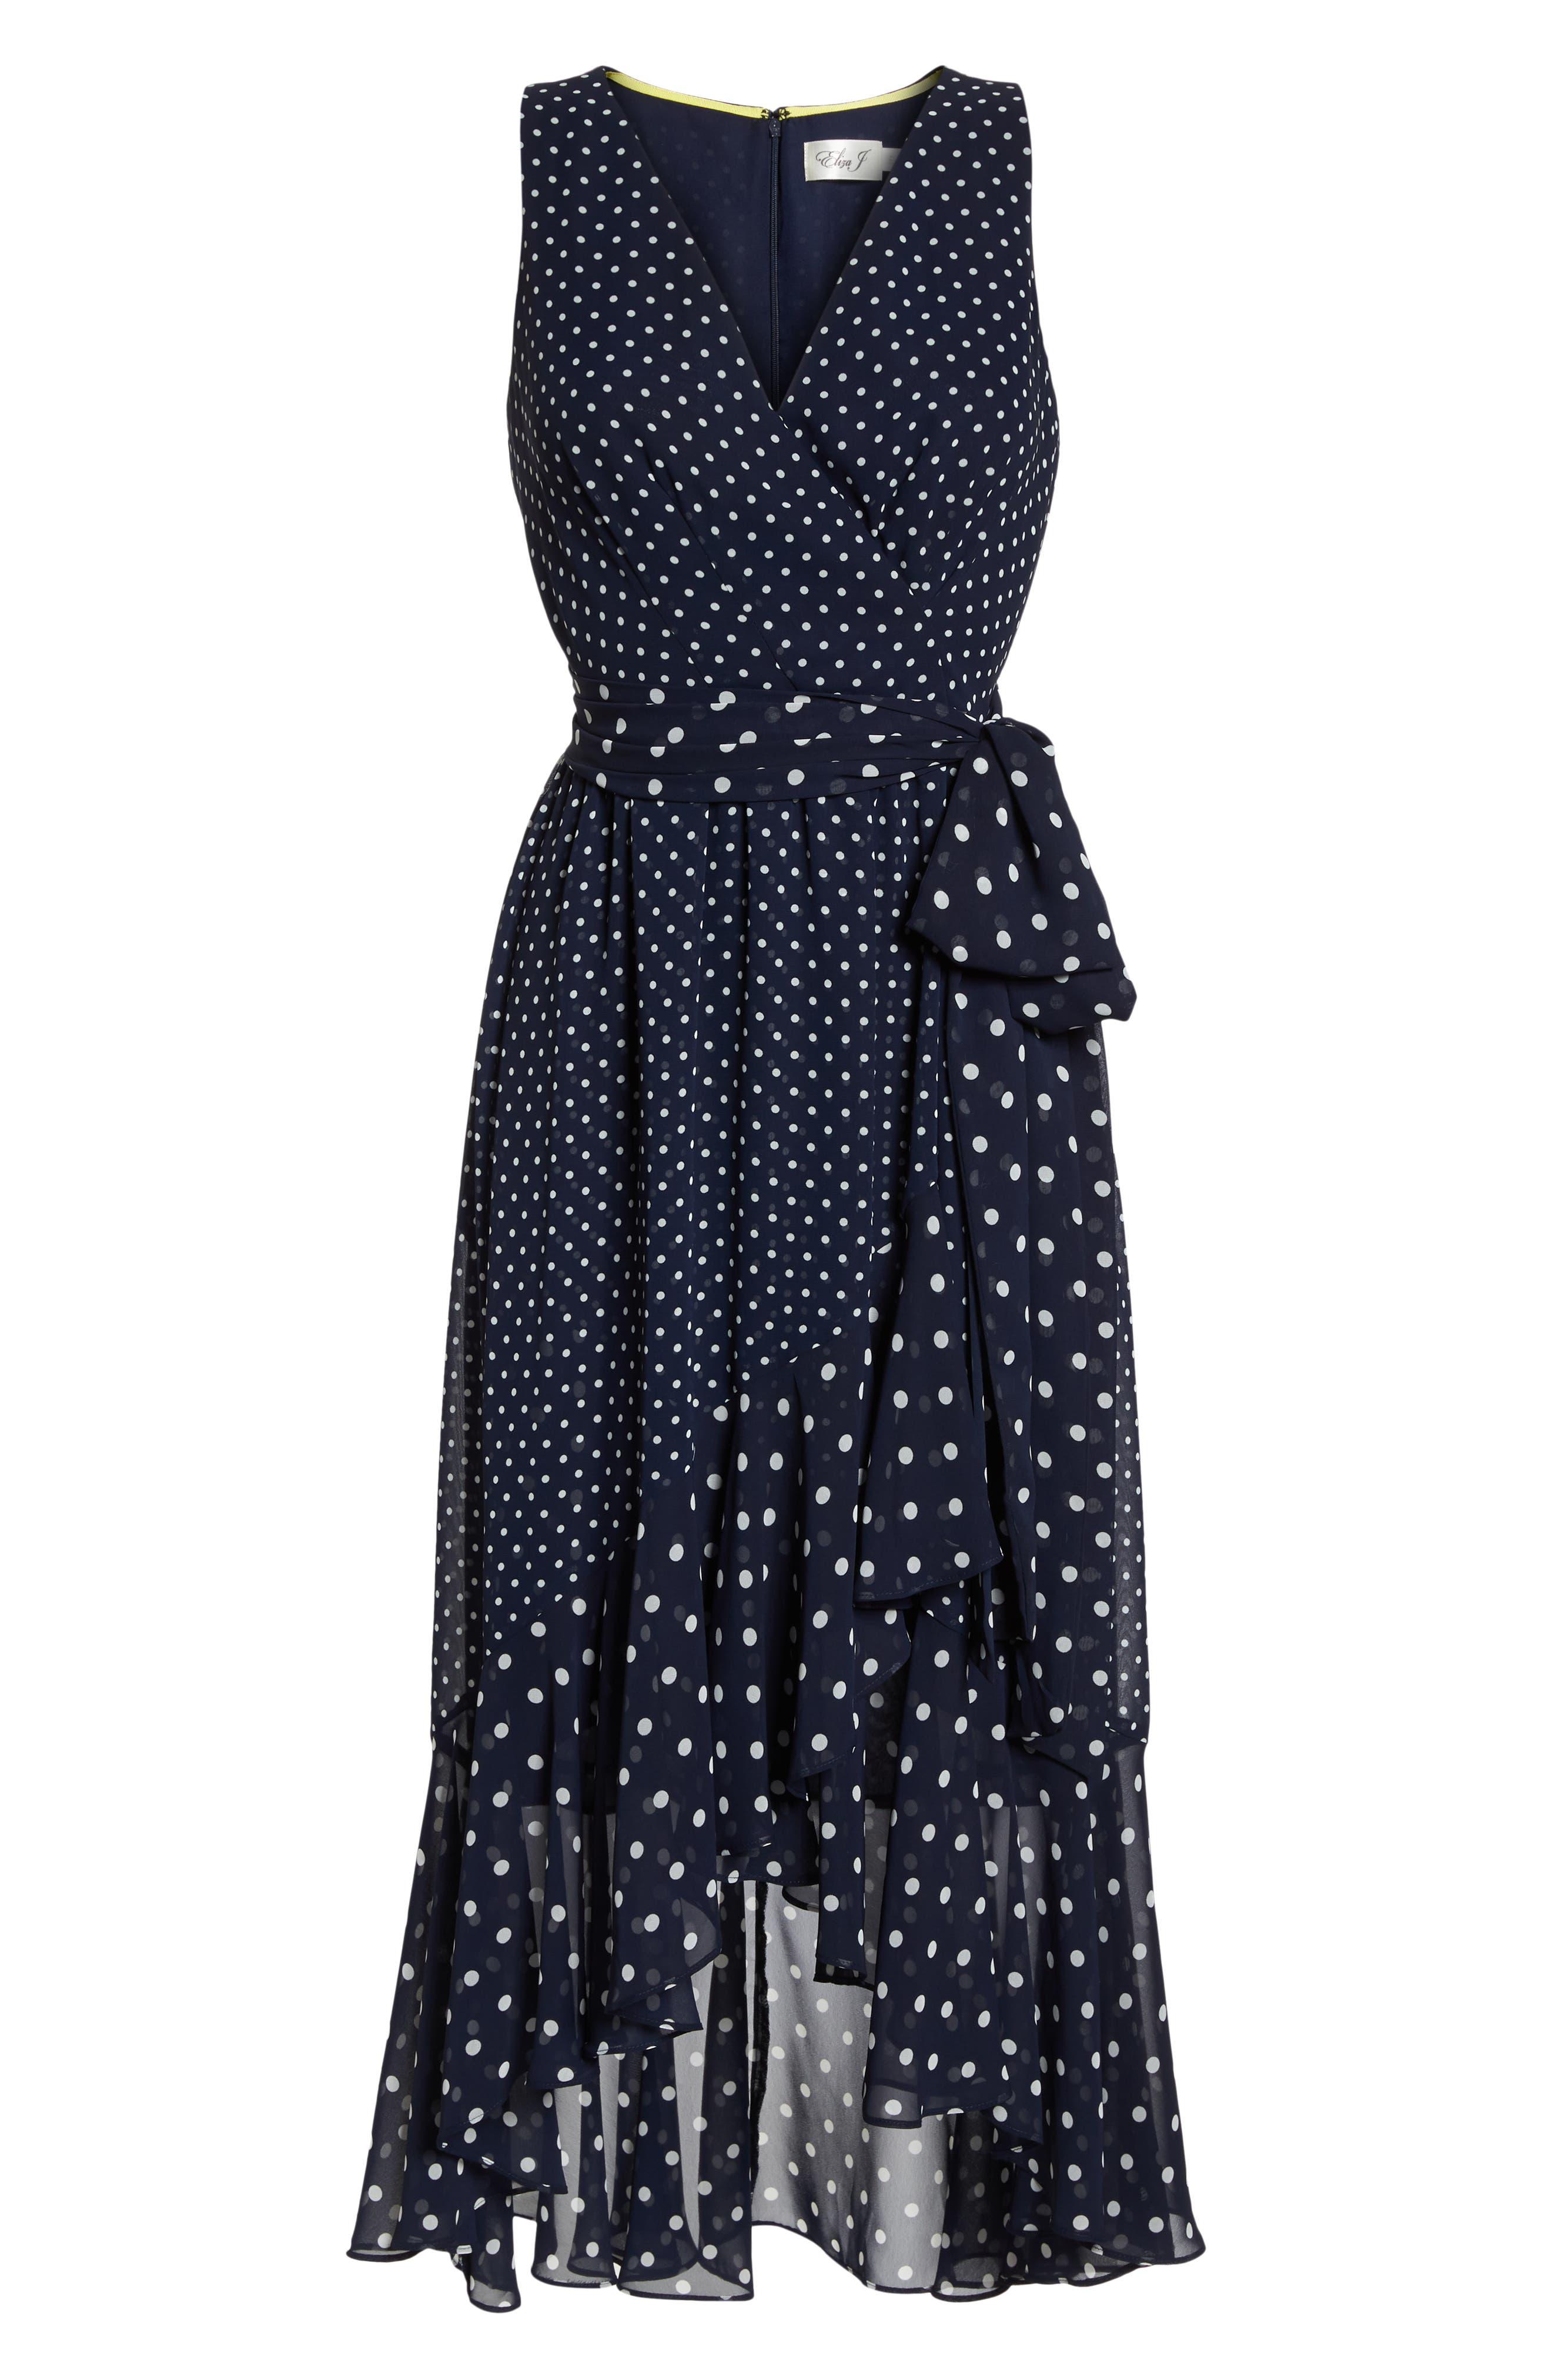 ELIZA J,                             Polka Dot High/Low Hem Dress,                             Alternate thumbnail 7, color,                             407